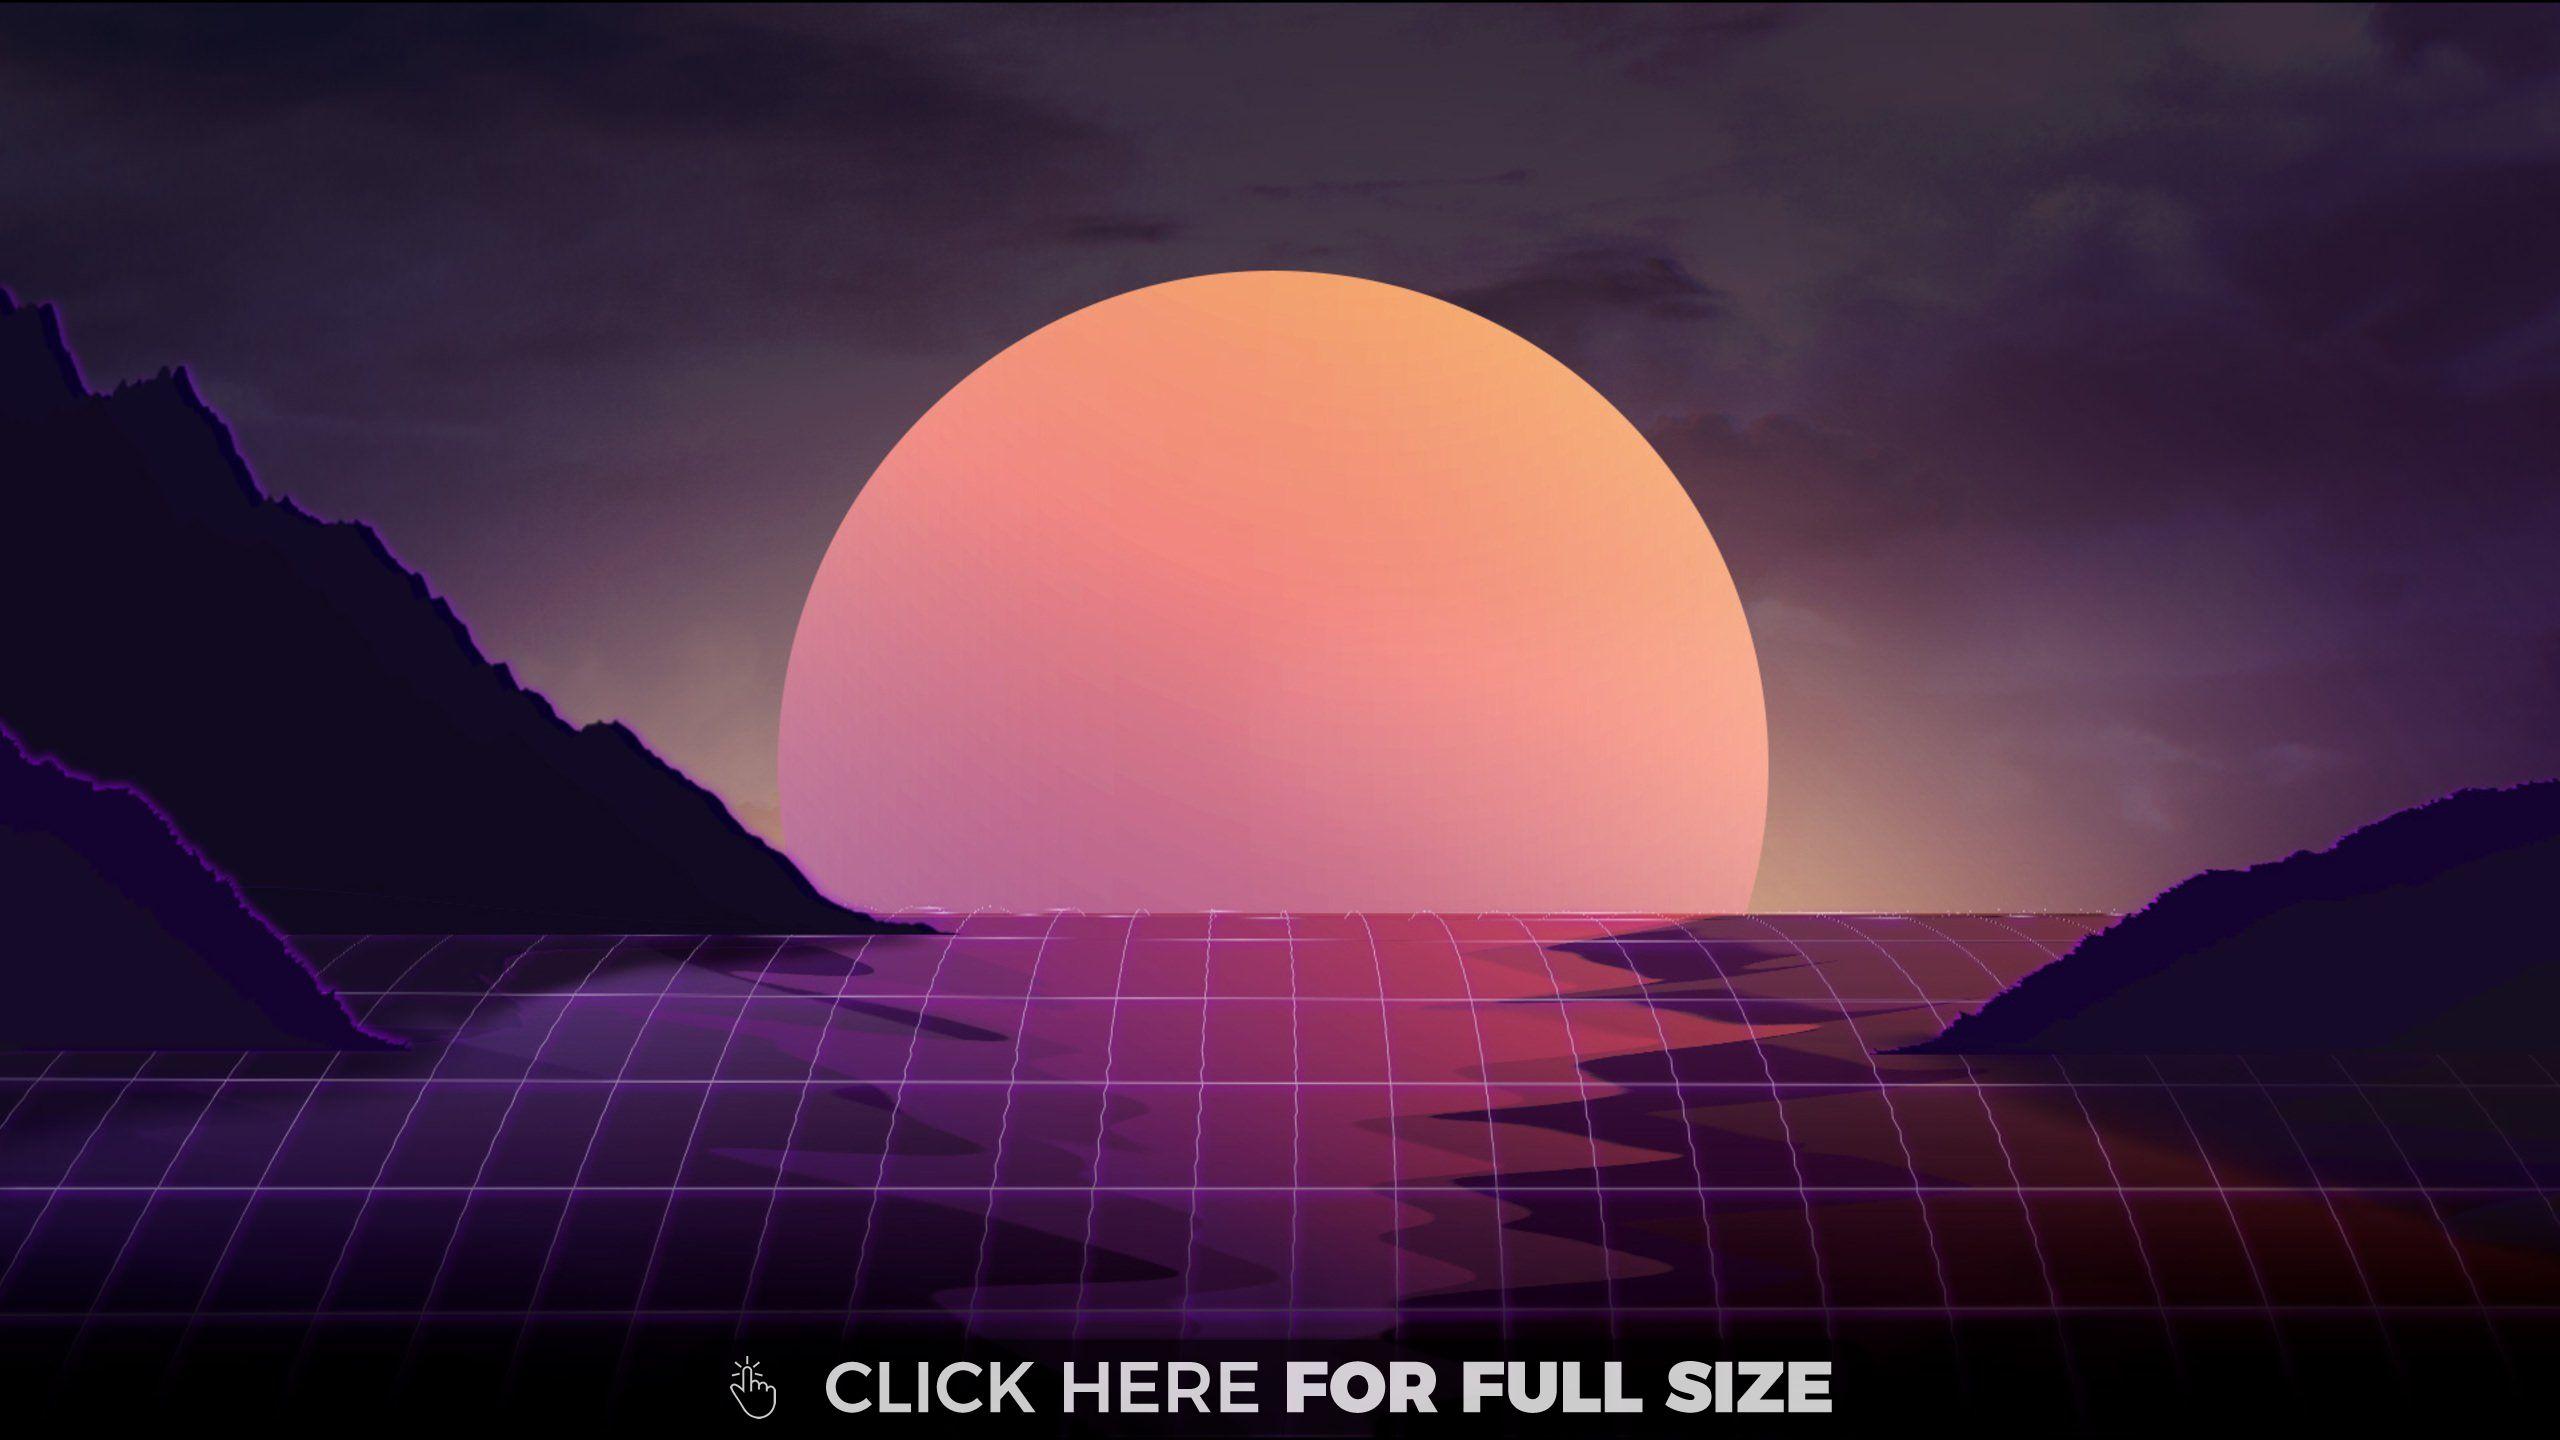 Vaporwave Sunset Hd Wallpaper Vaporwave Wallpaper 2048x1152 Wallpapers Waves Wallpaper